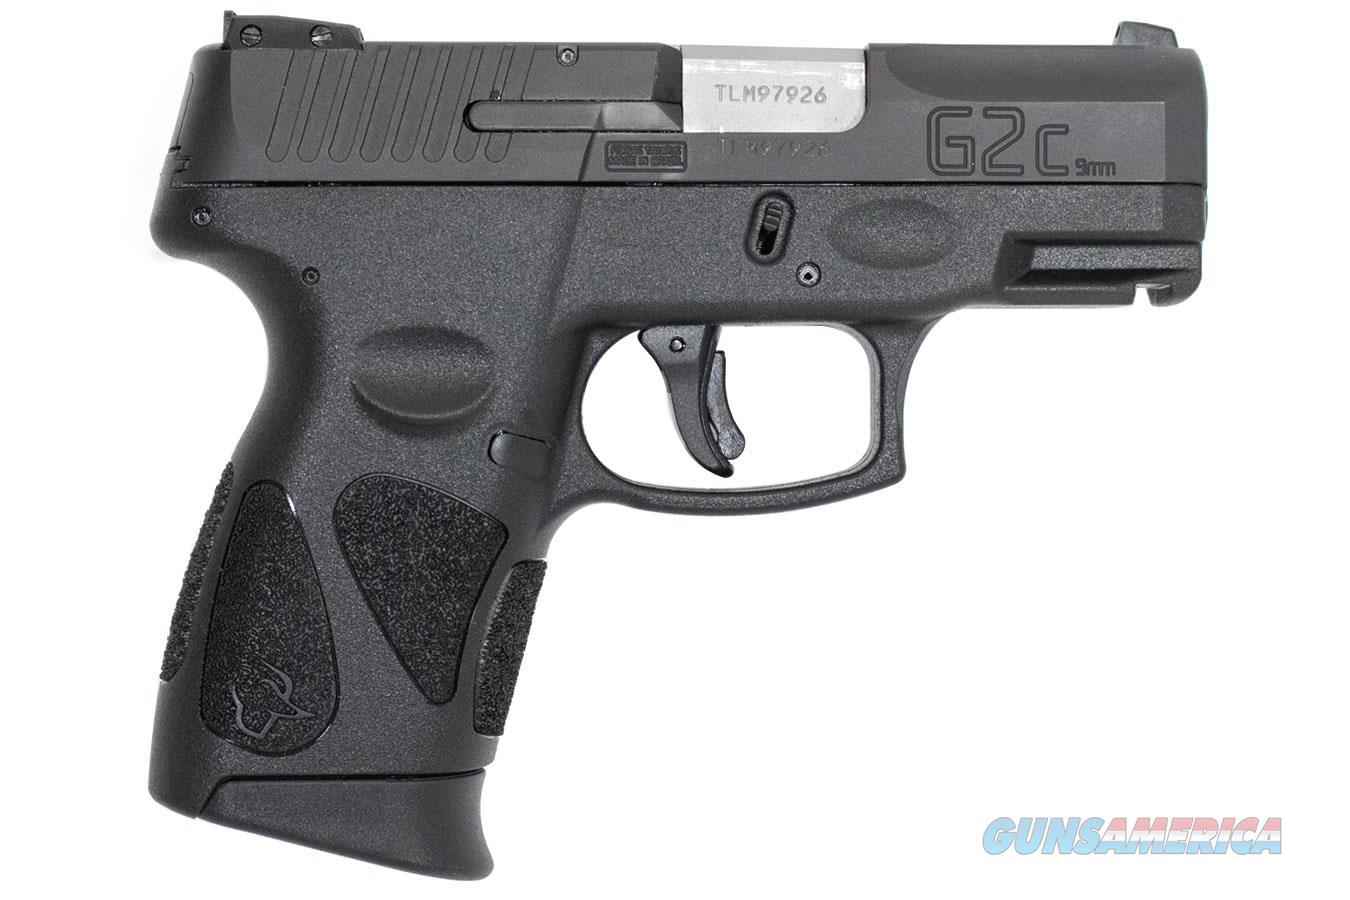 "Taurus PT111 G2C Compact Semi Auto Pistol 9mm Luger 3.2"" Barrel 12 Rounds Double Action Only 3 Dot Sights Black Slide/Black Polymer Frame. NIB !!!  Guns > Pistols > Taurus Pistols > Semi Auto Pistols > Polymer Frame"